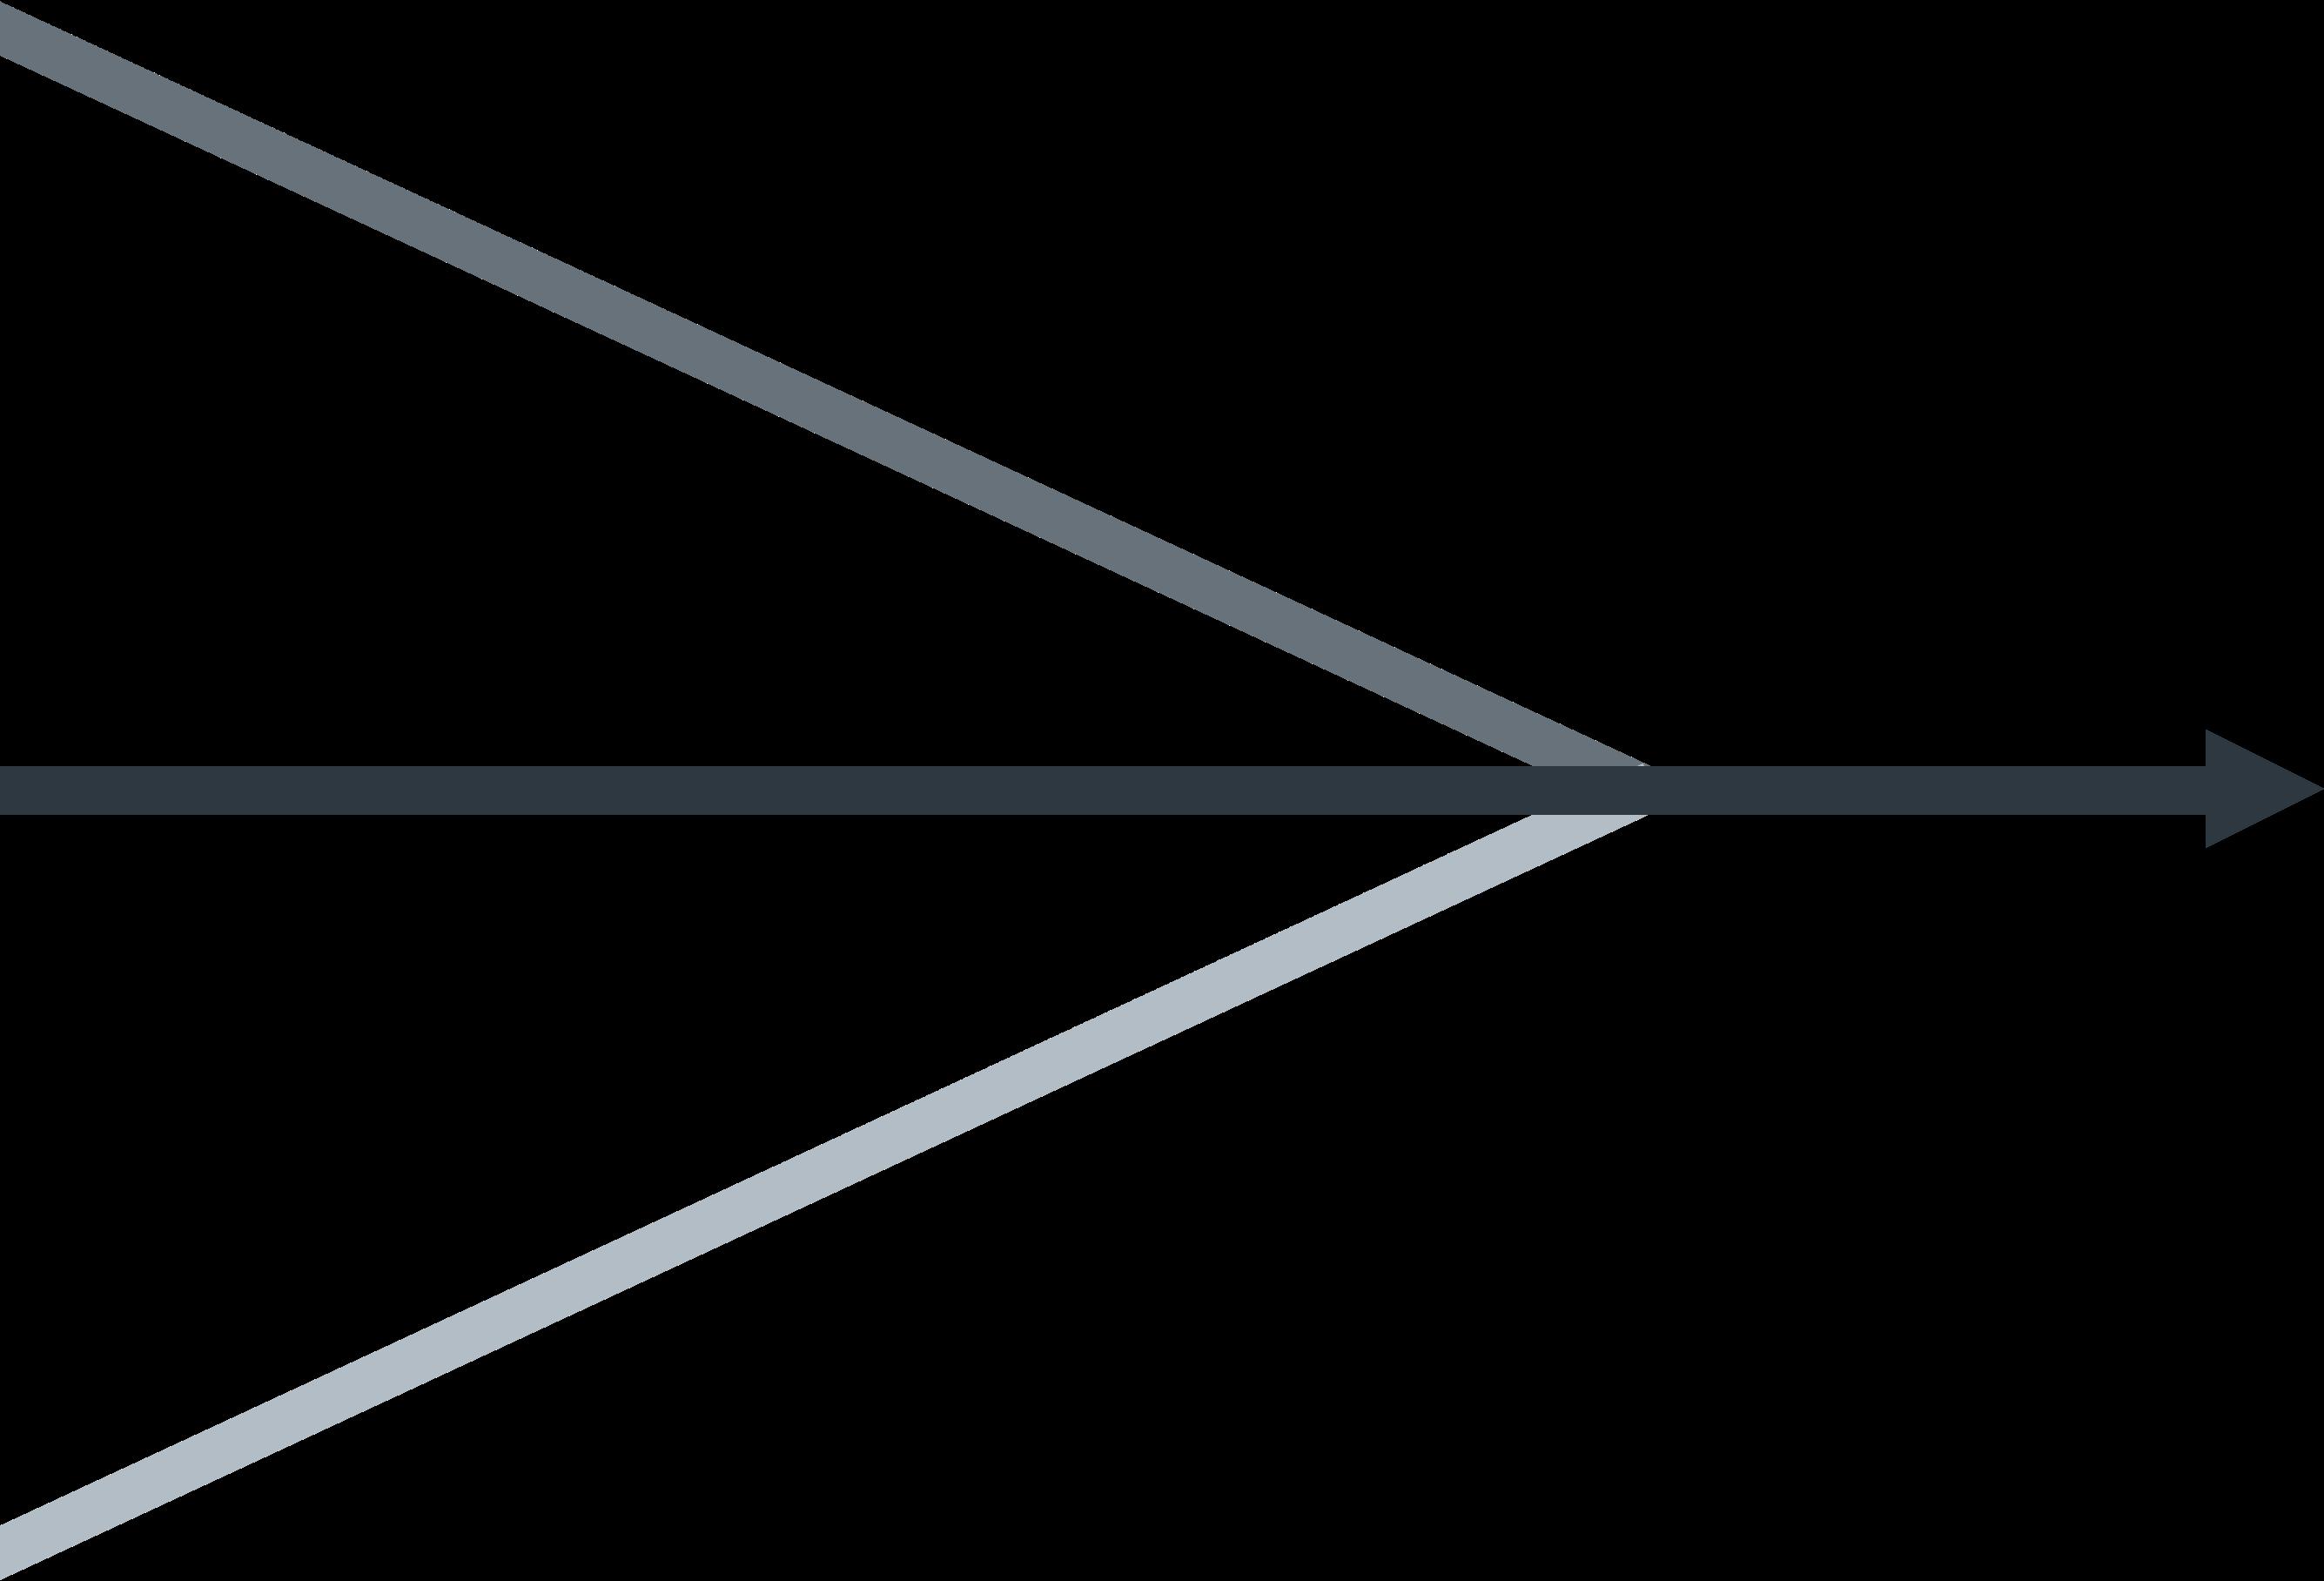 Arrow Illustration